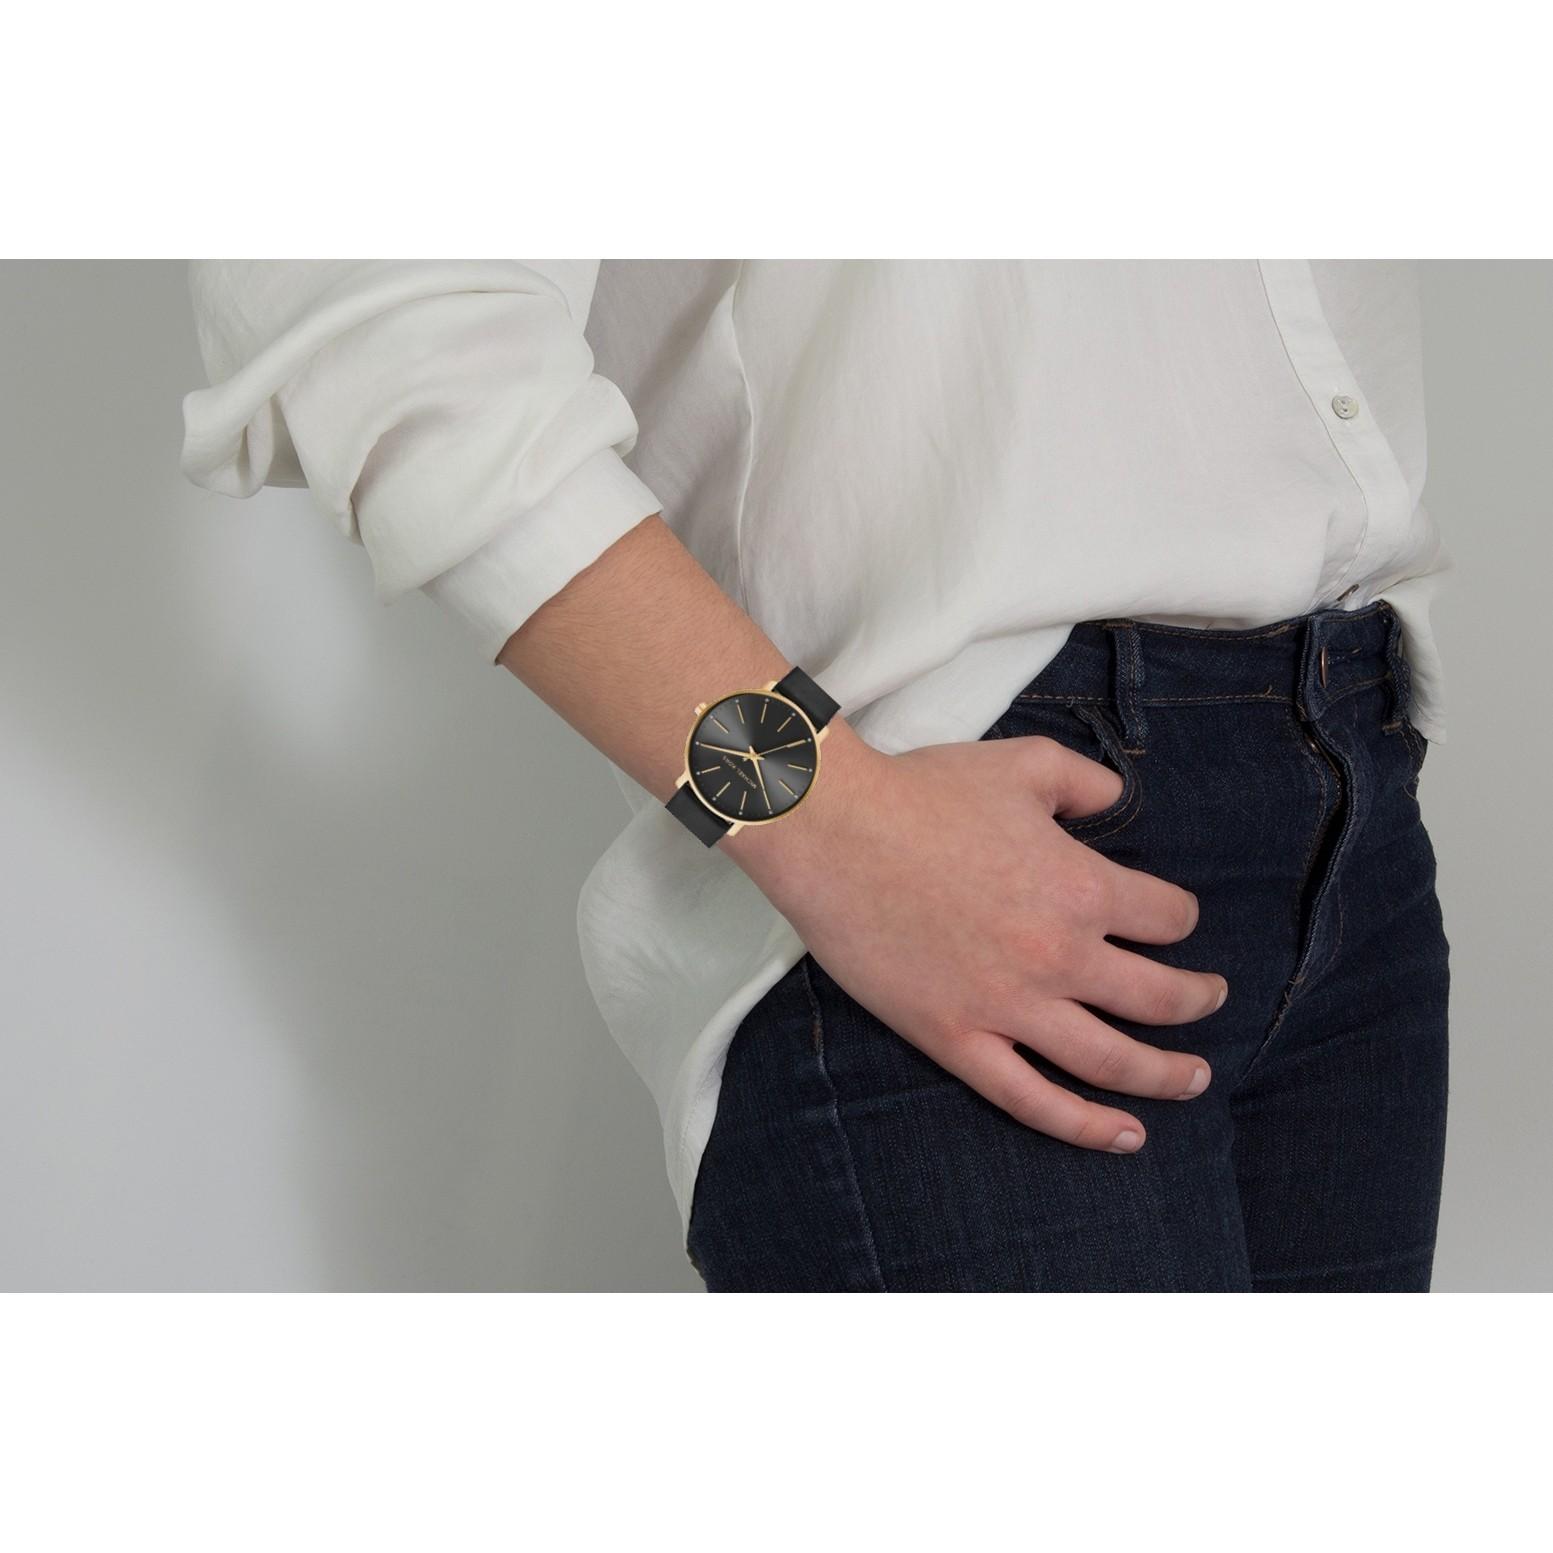 769c0fa67333 Black Leather MK2747 Michael Kors Watch